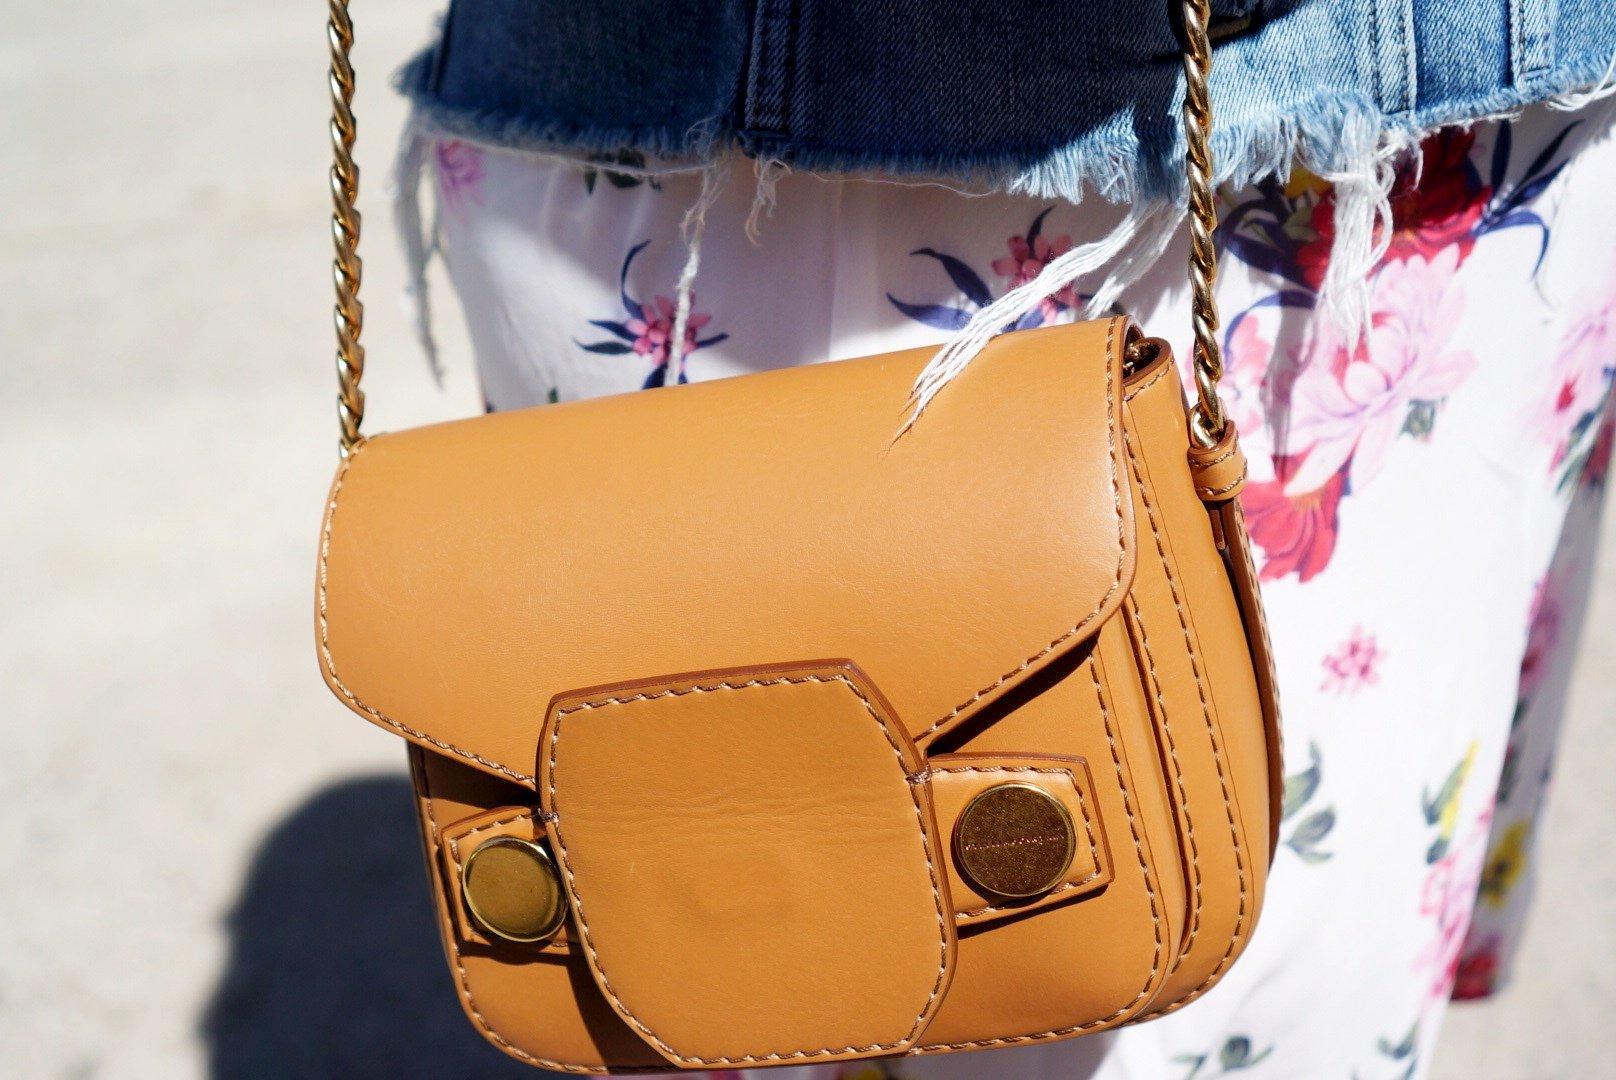 Stella-Bag-and-Flower-Dress